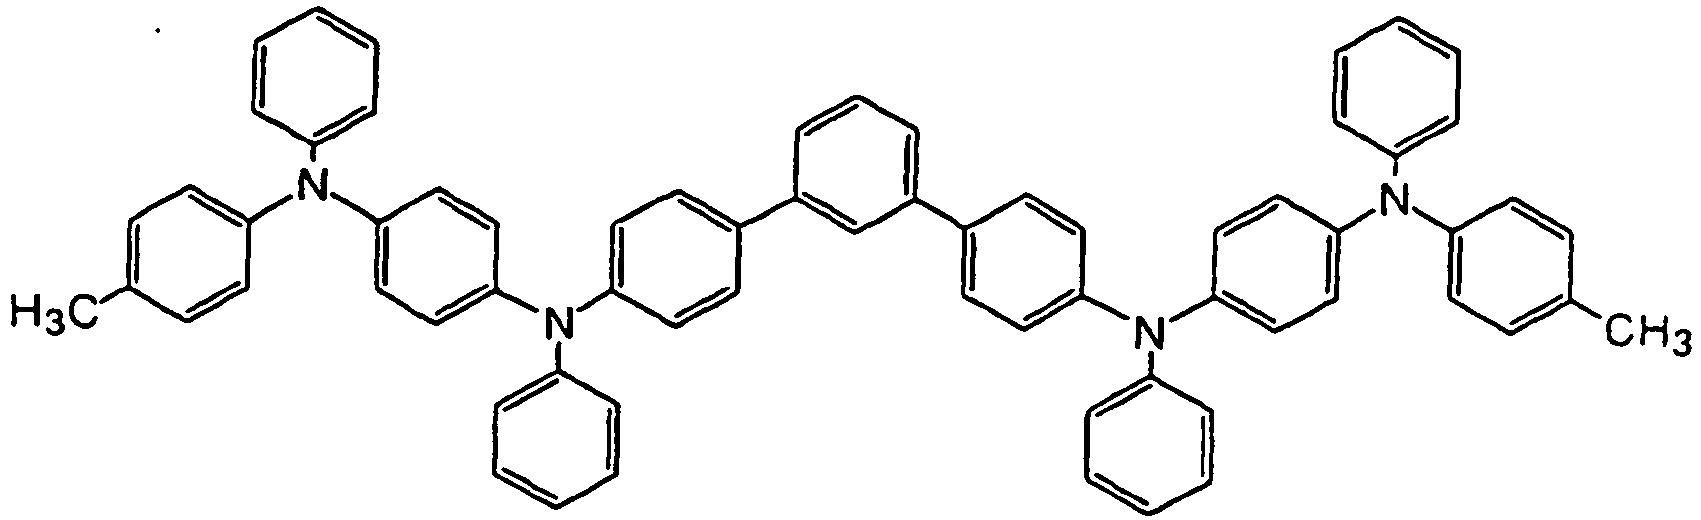 Figure imgb0934